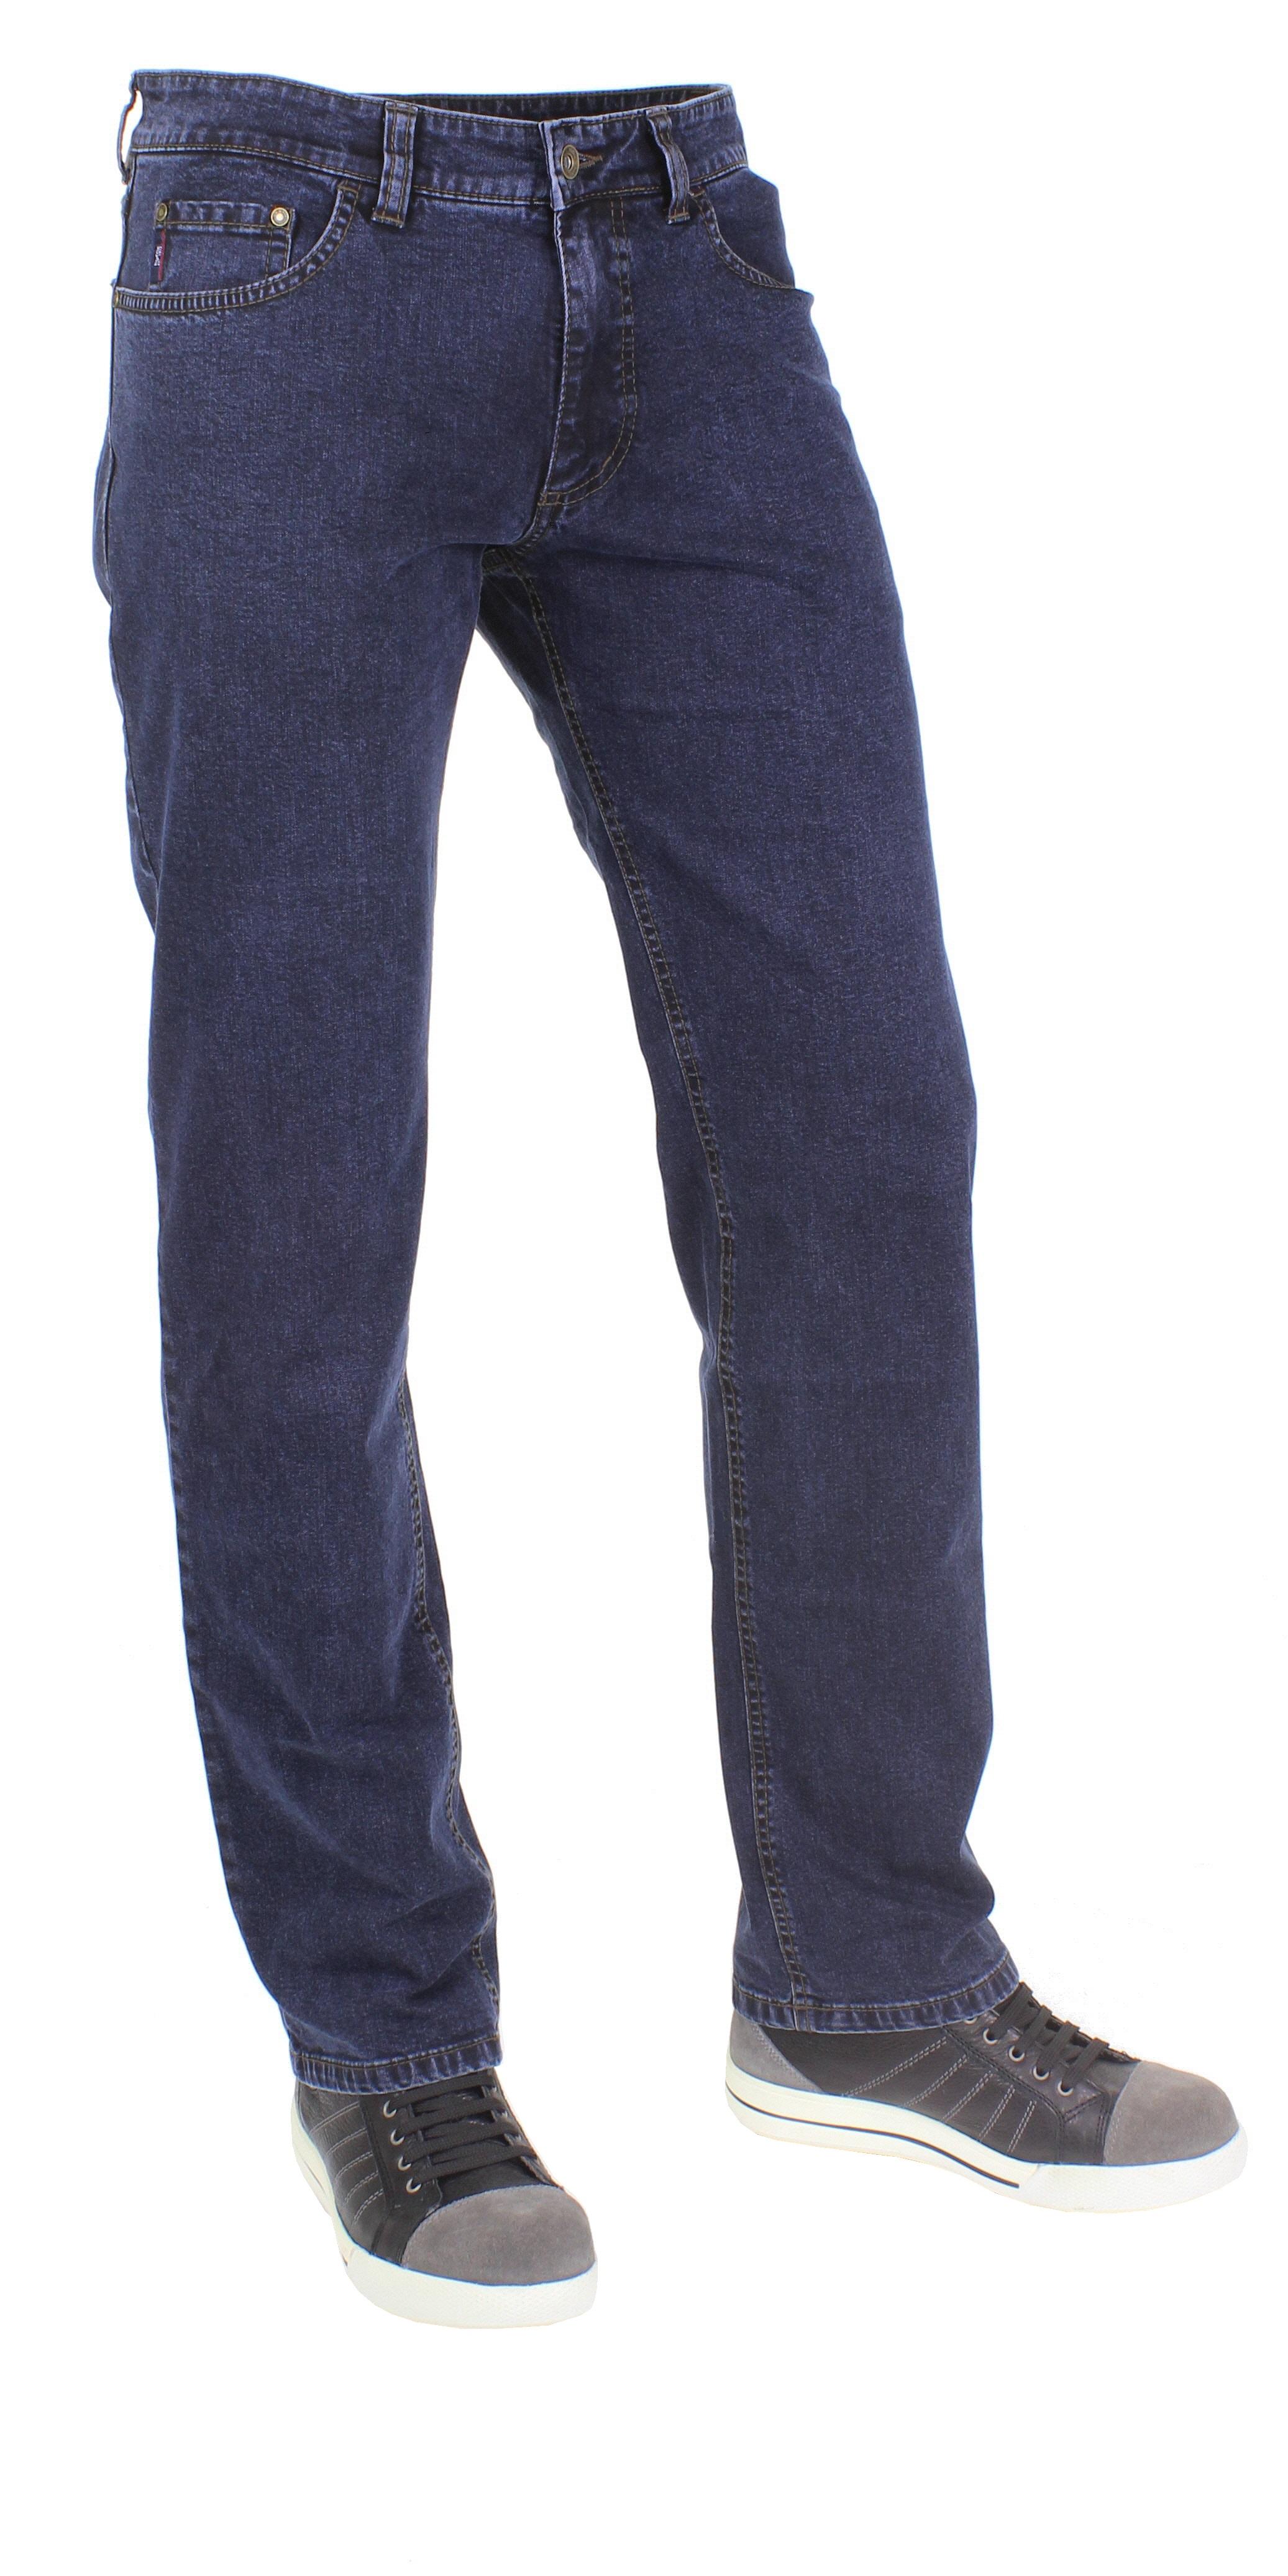 Hattric HARDY Stretch Jeans 688005